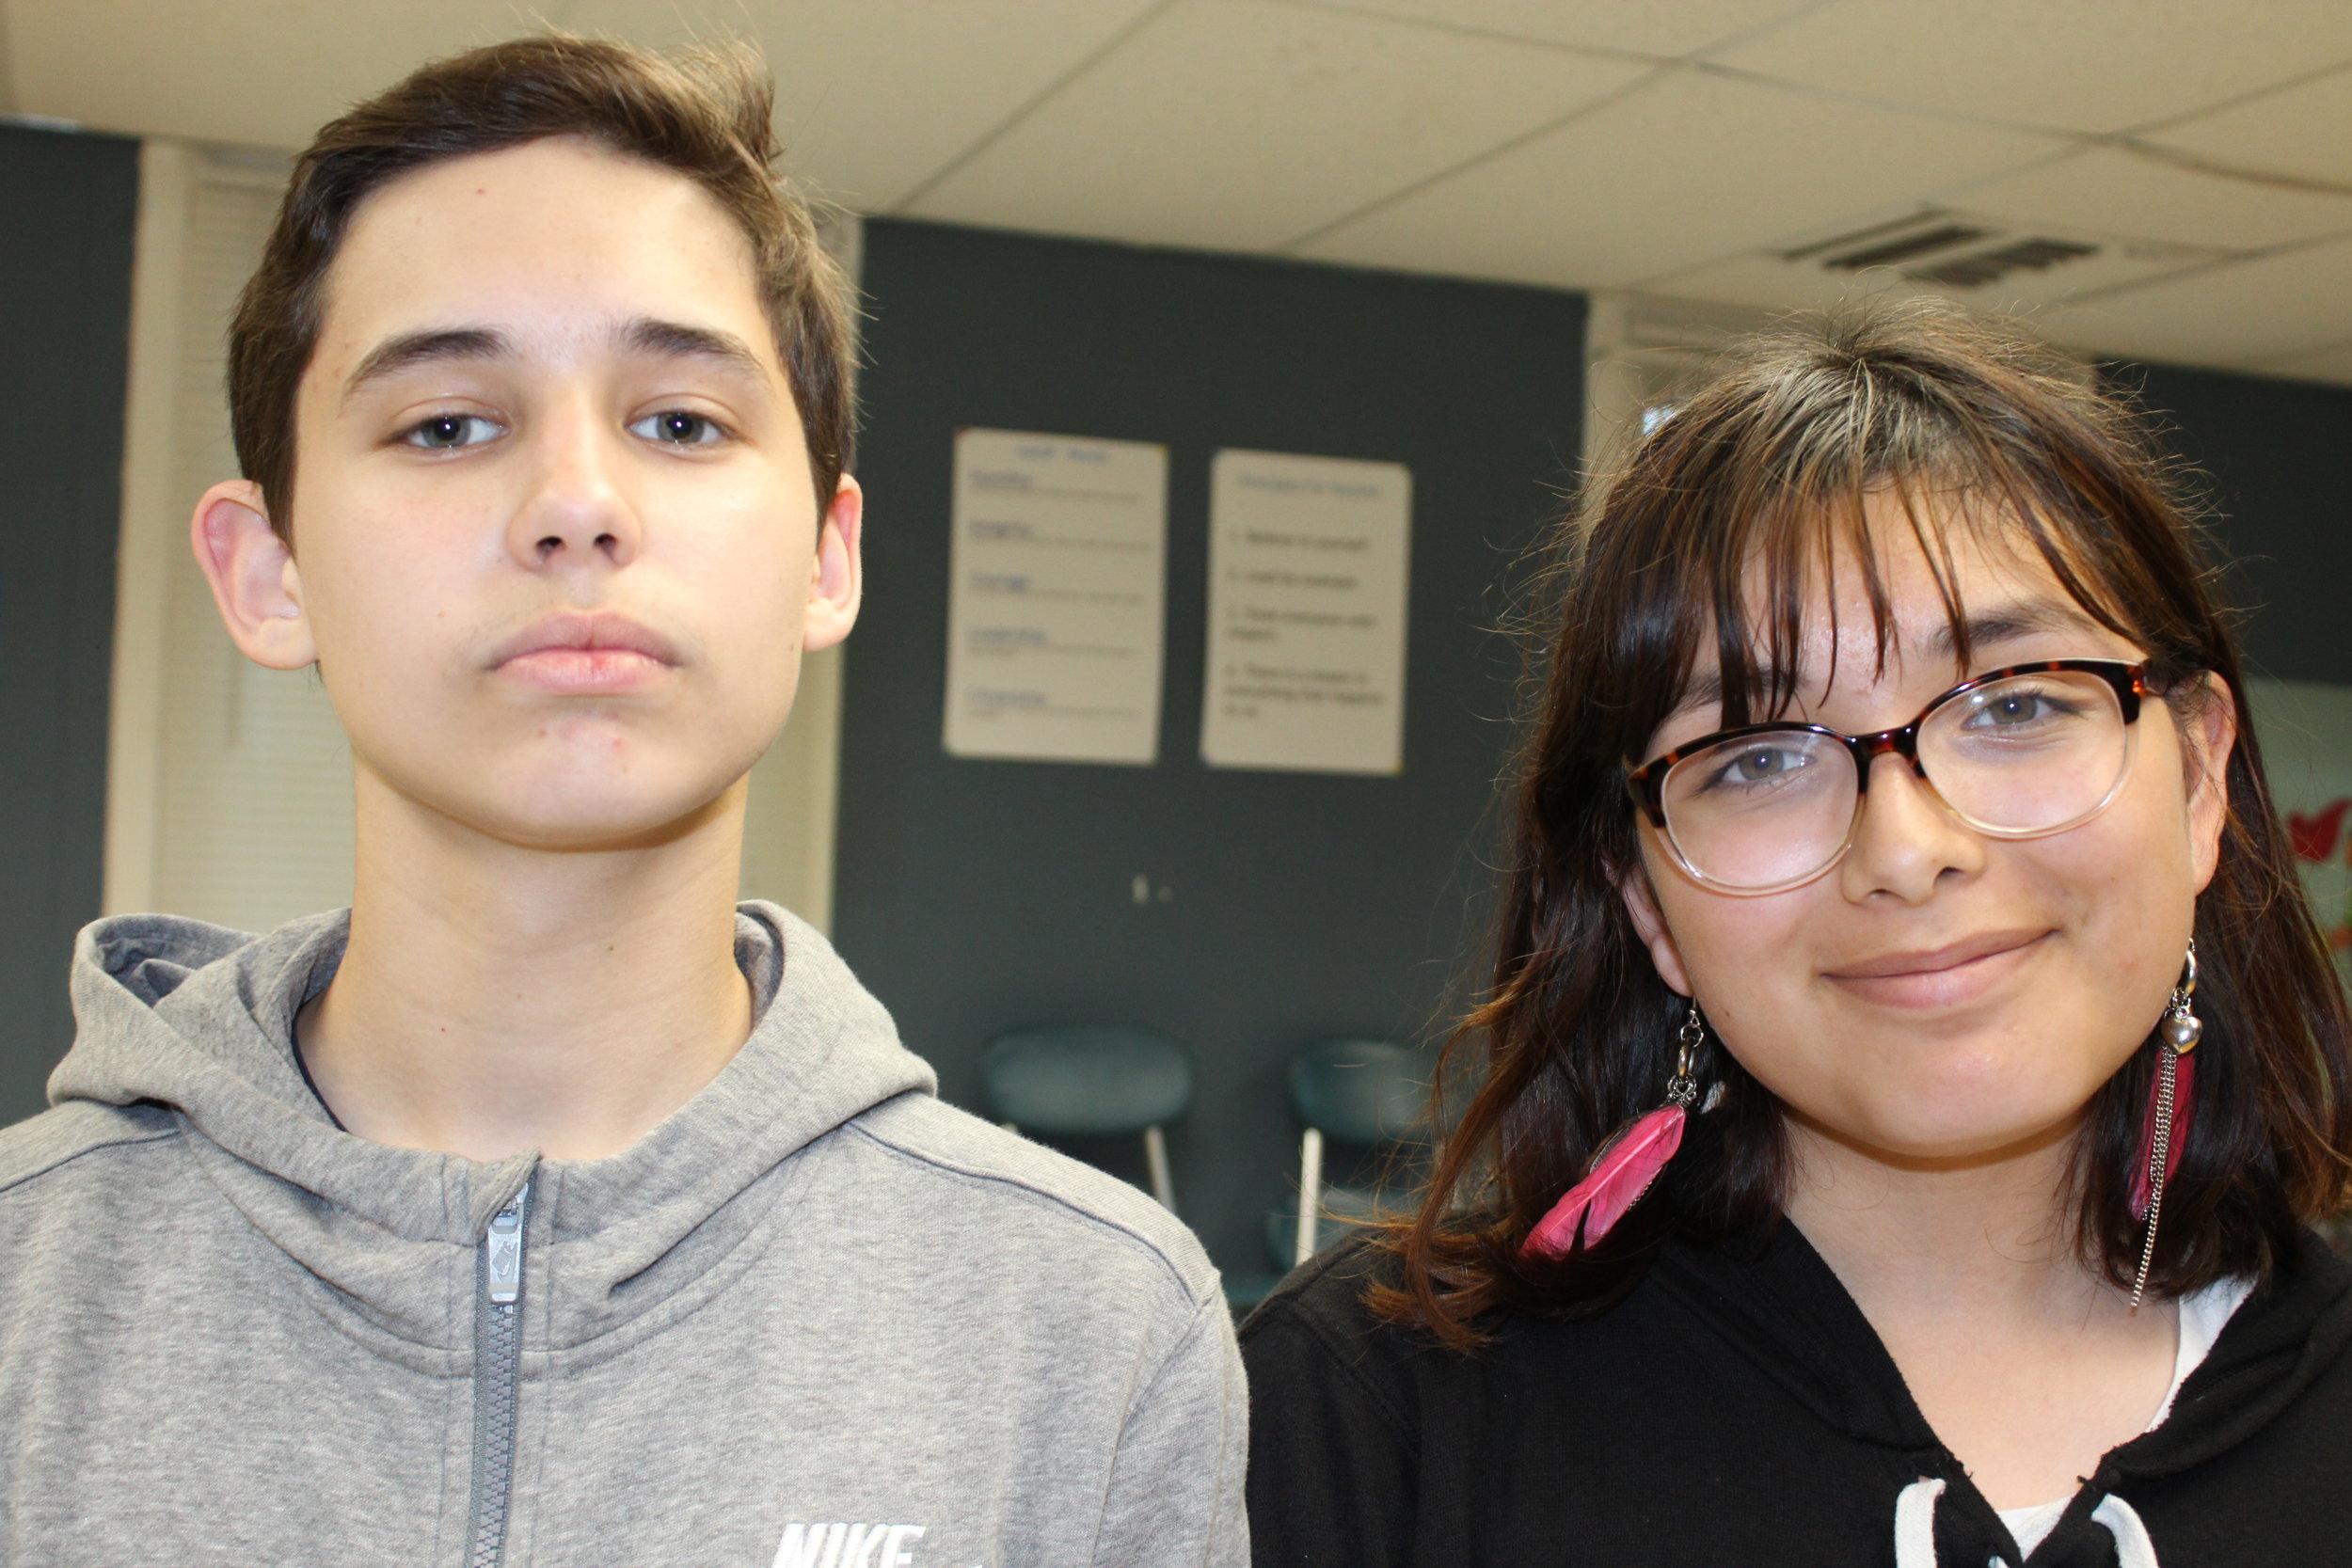 Volunteers Sabastian Samperez and Emily Becerril